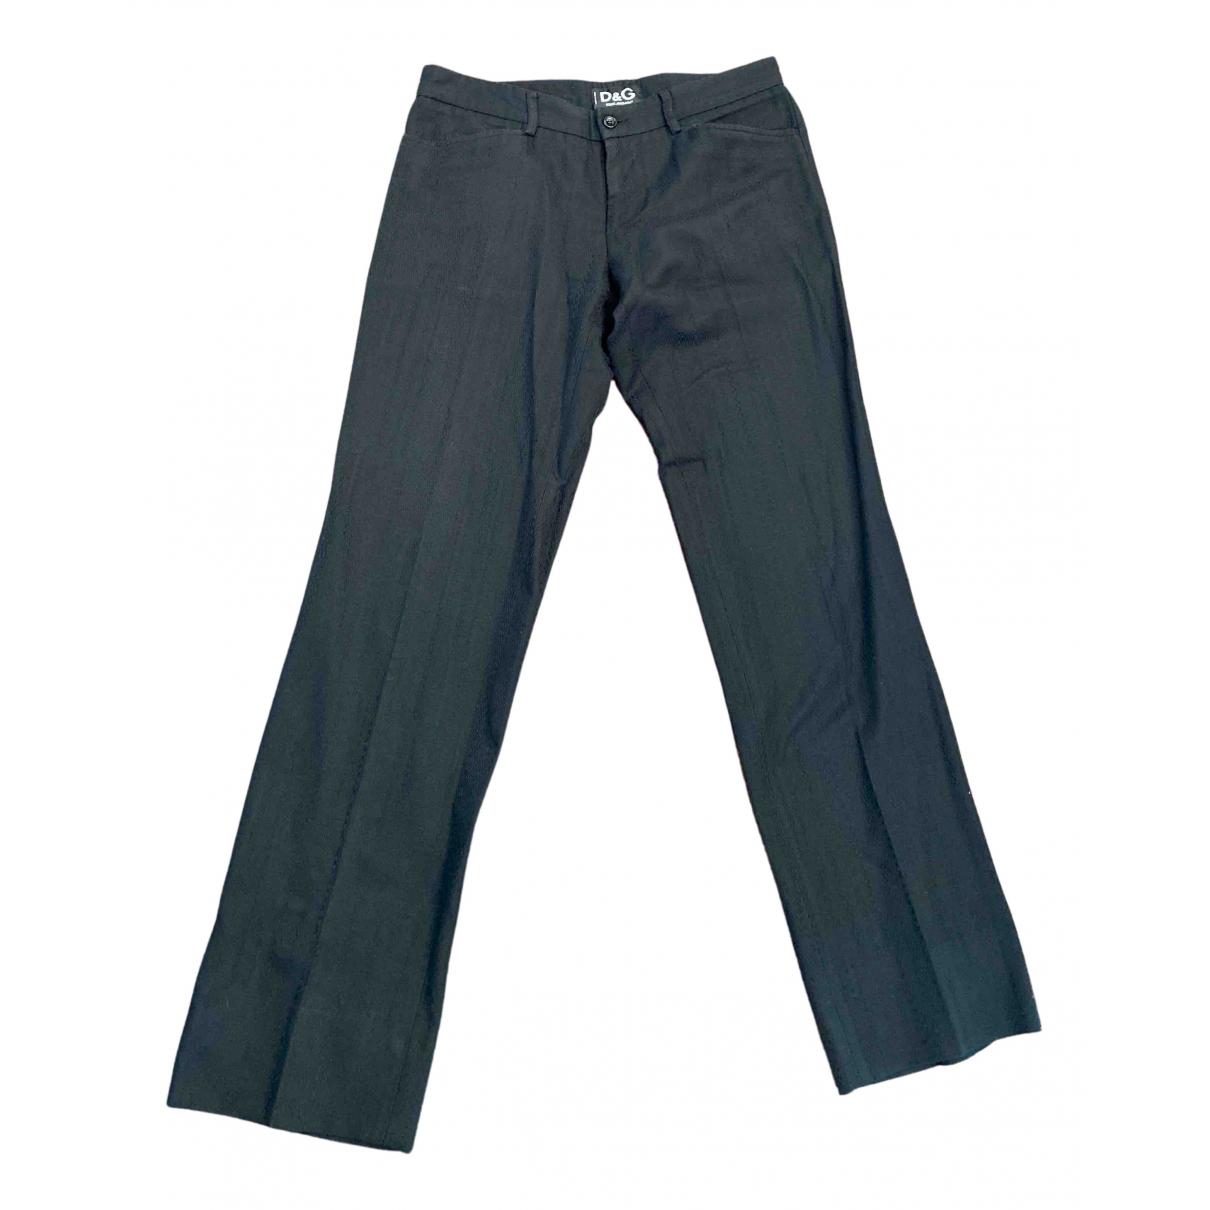 Pantalones en Algodon Negro D&g